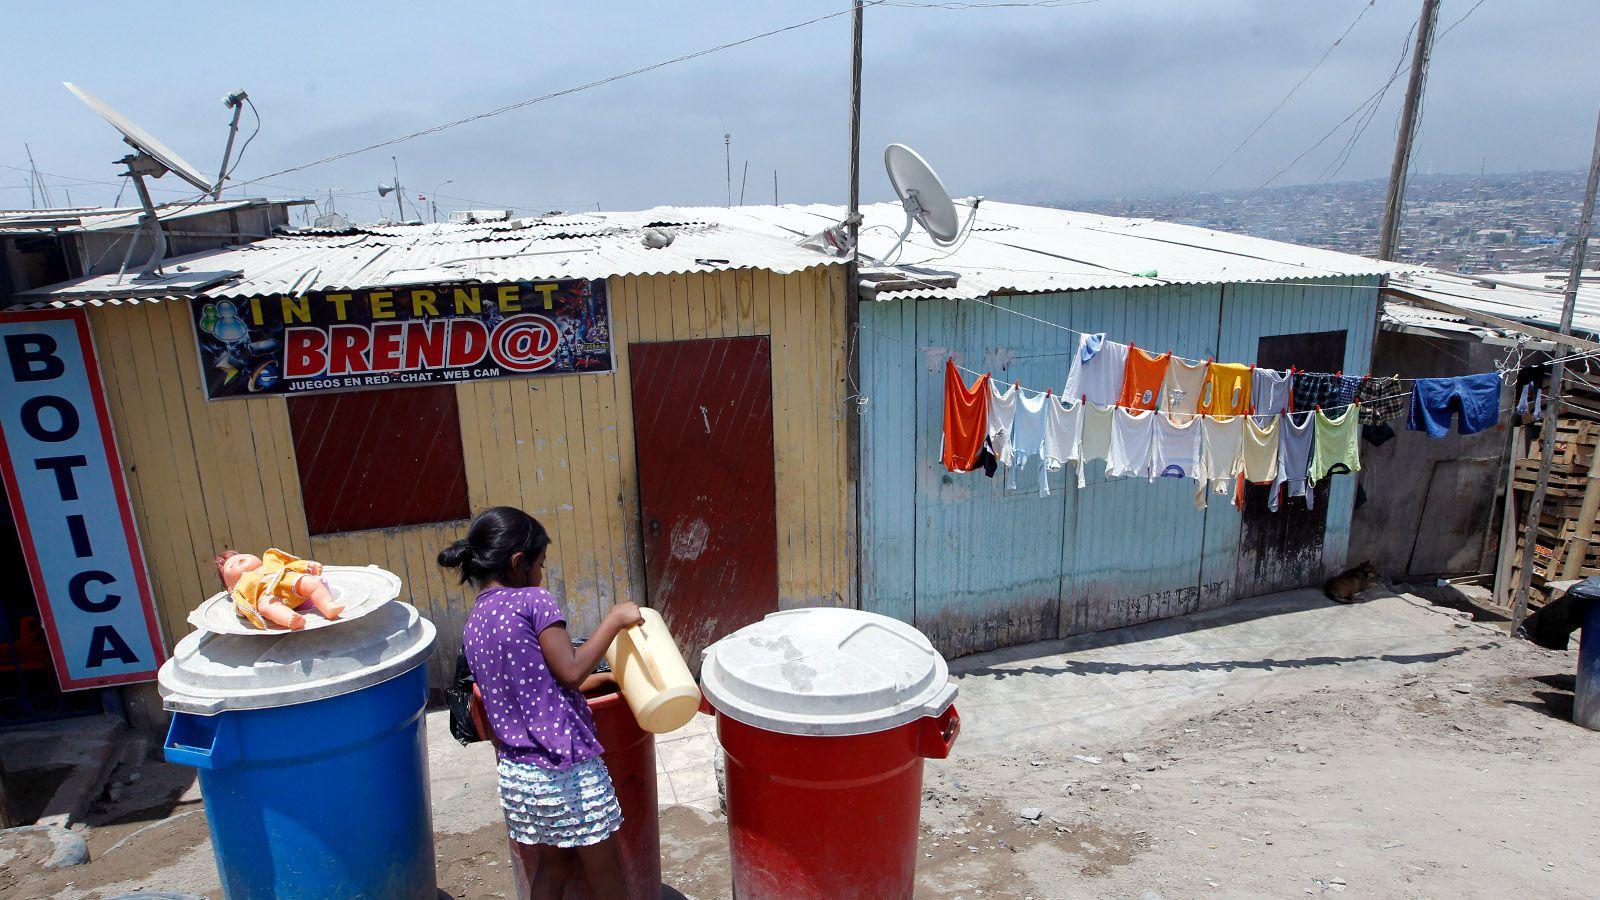 A public internet service is seen in Juan Pablo II shanty town in Villa El Salvador,Lima January 31, 2012.